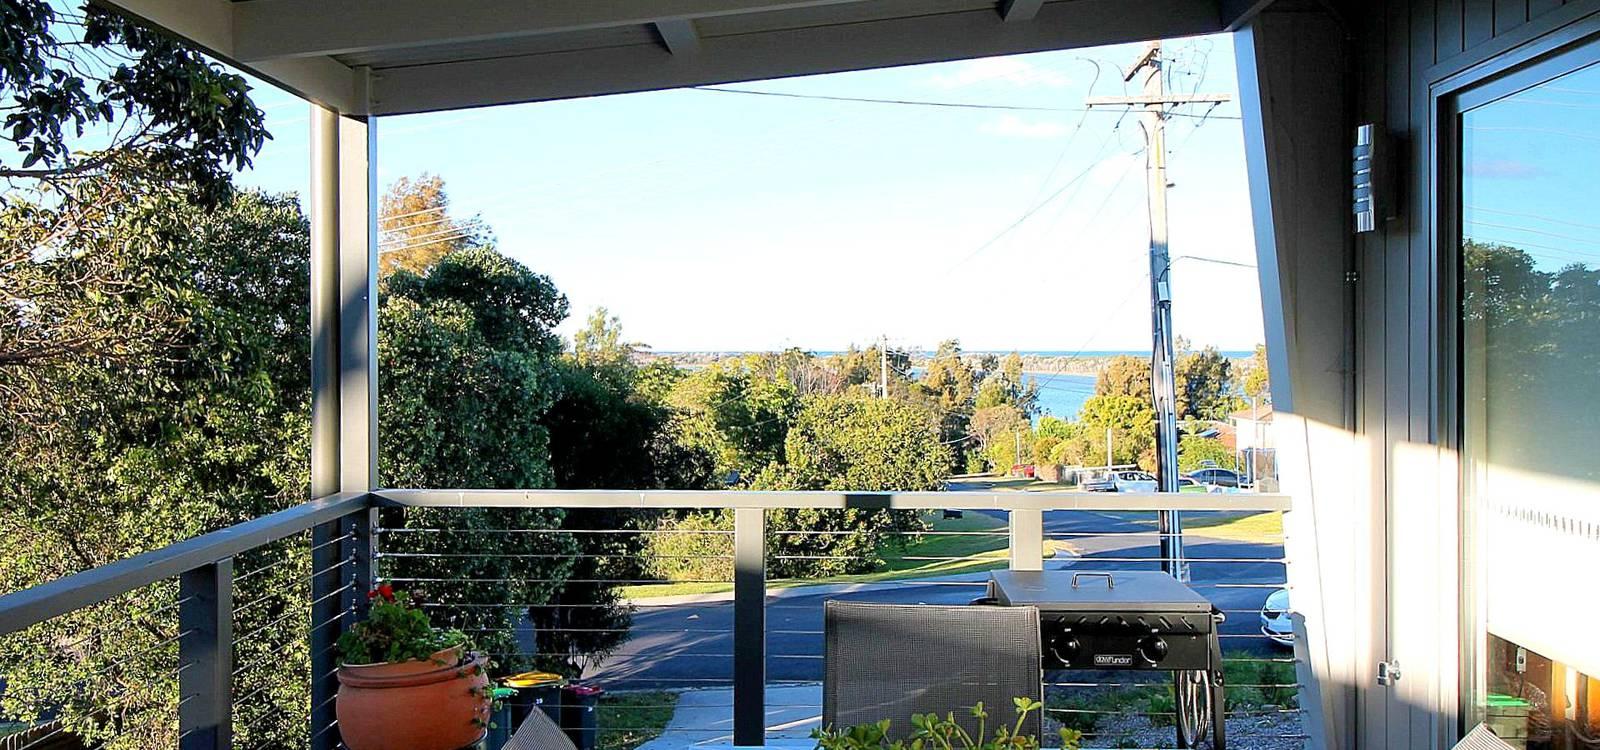 39 Manly Street TUROSS HEAD, NSW 2537 - photo 1